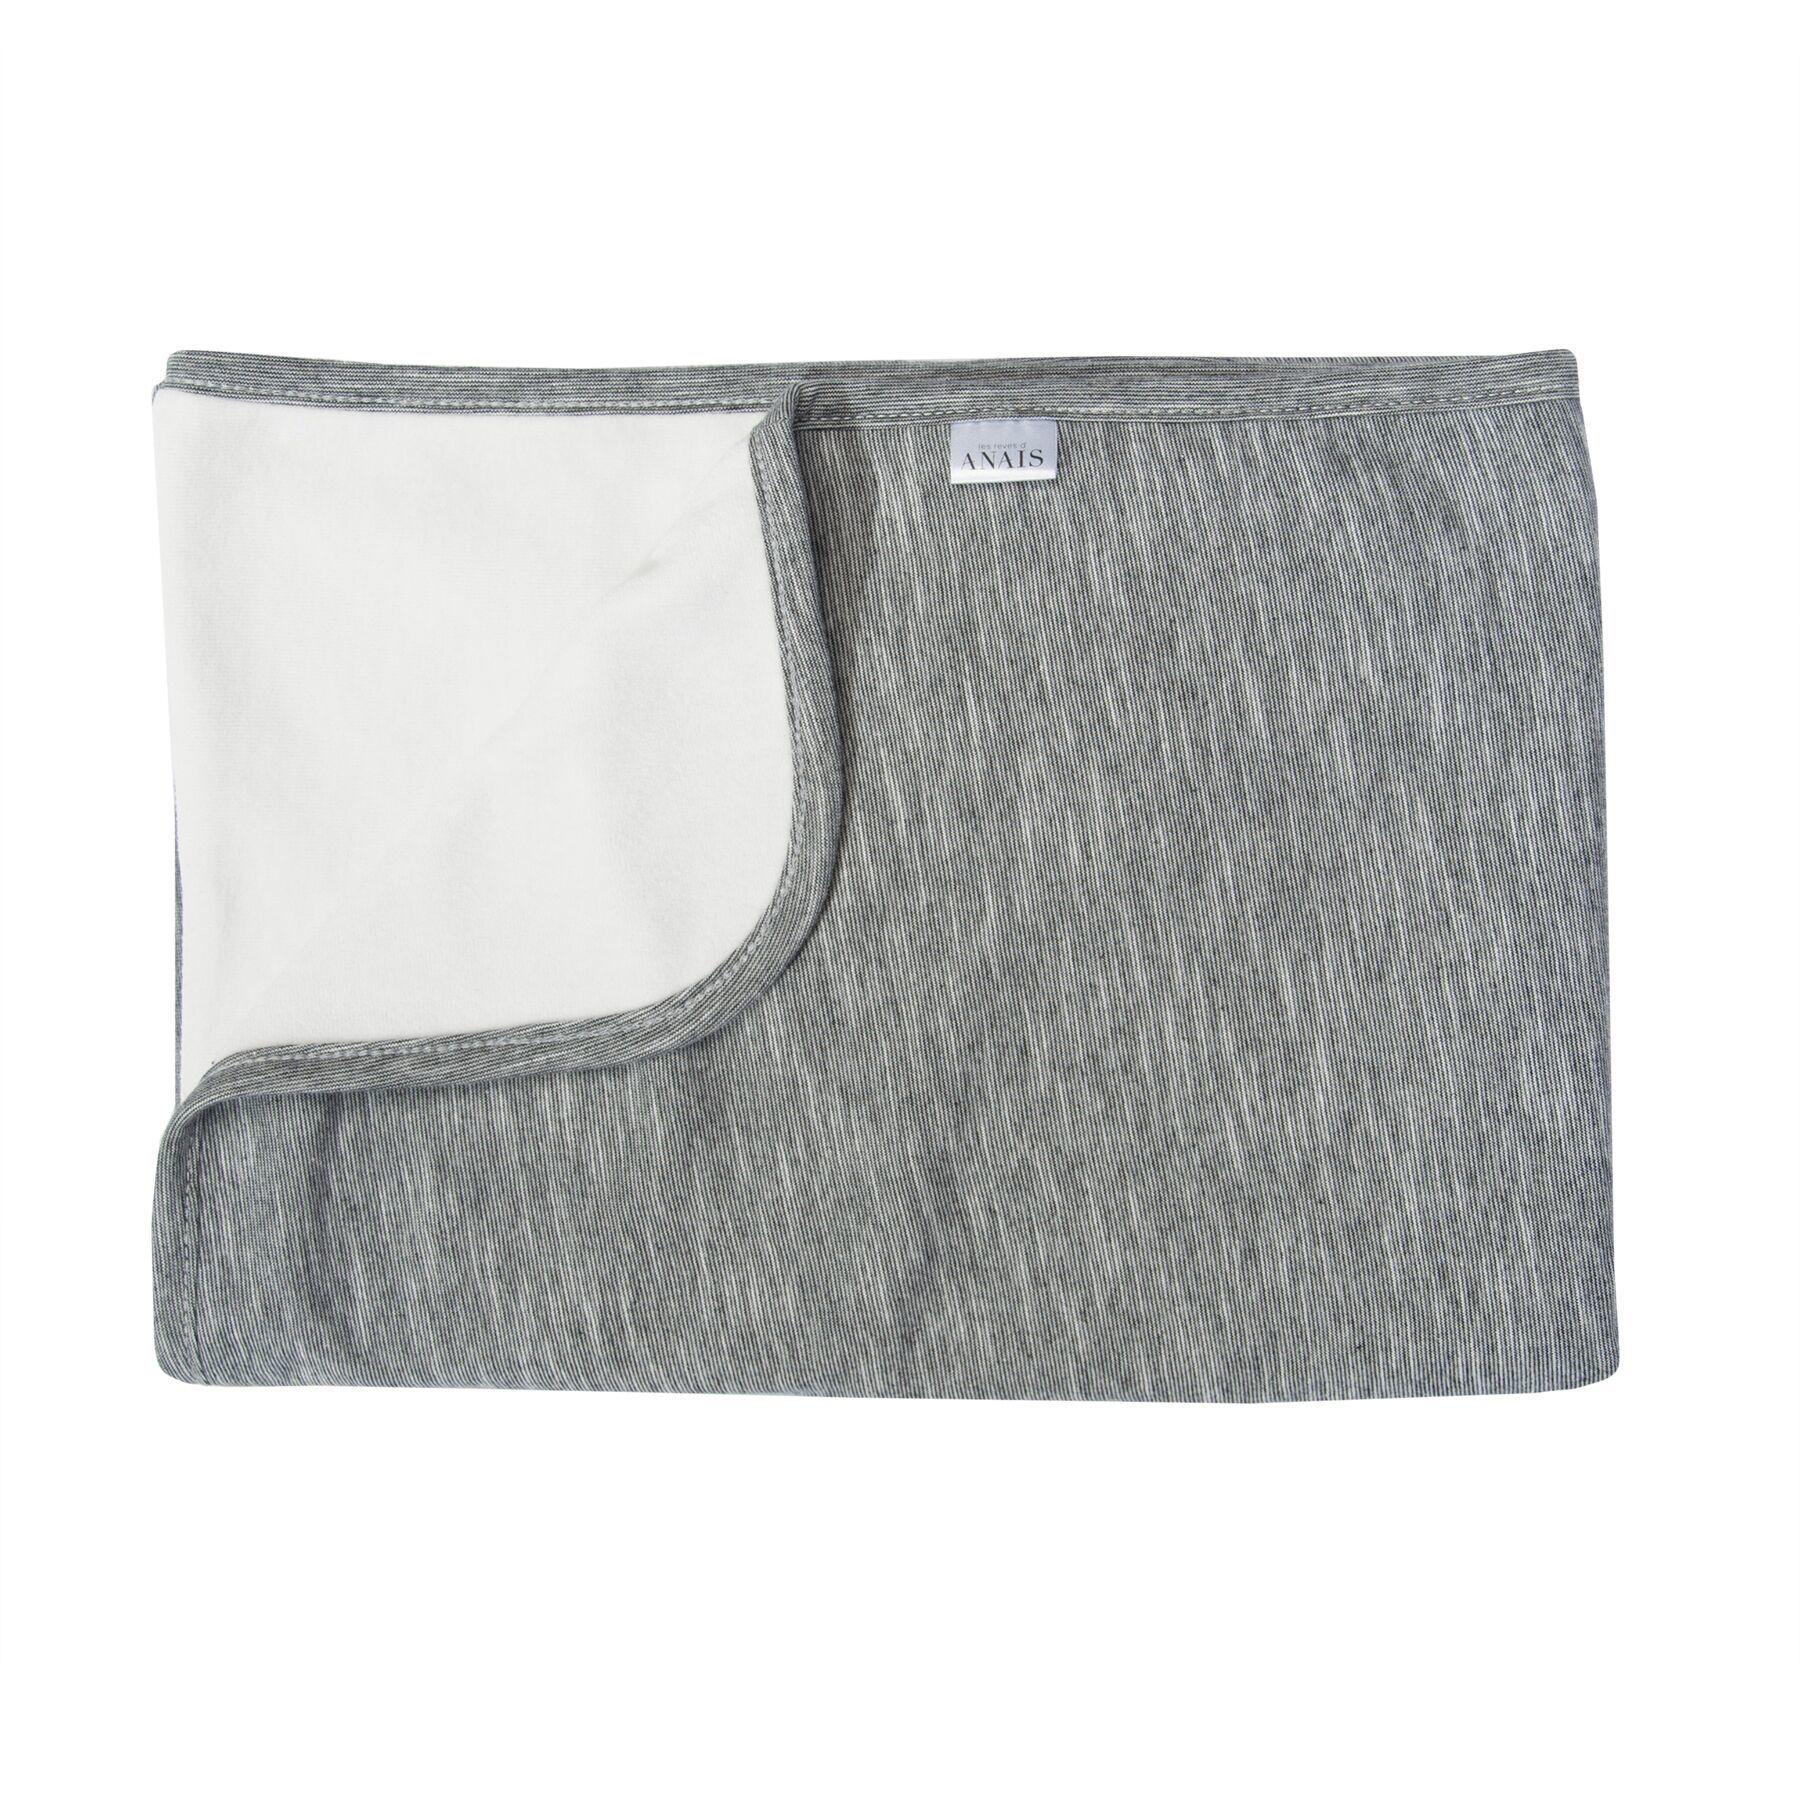 Les Rêves d'Anais Blanket 75x100cm Slim Stripes & Fleece